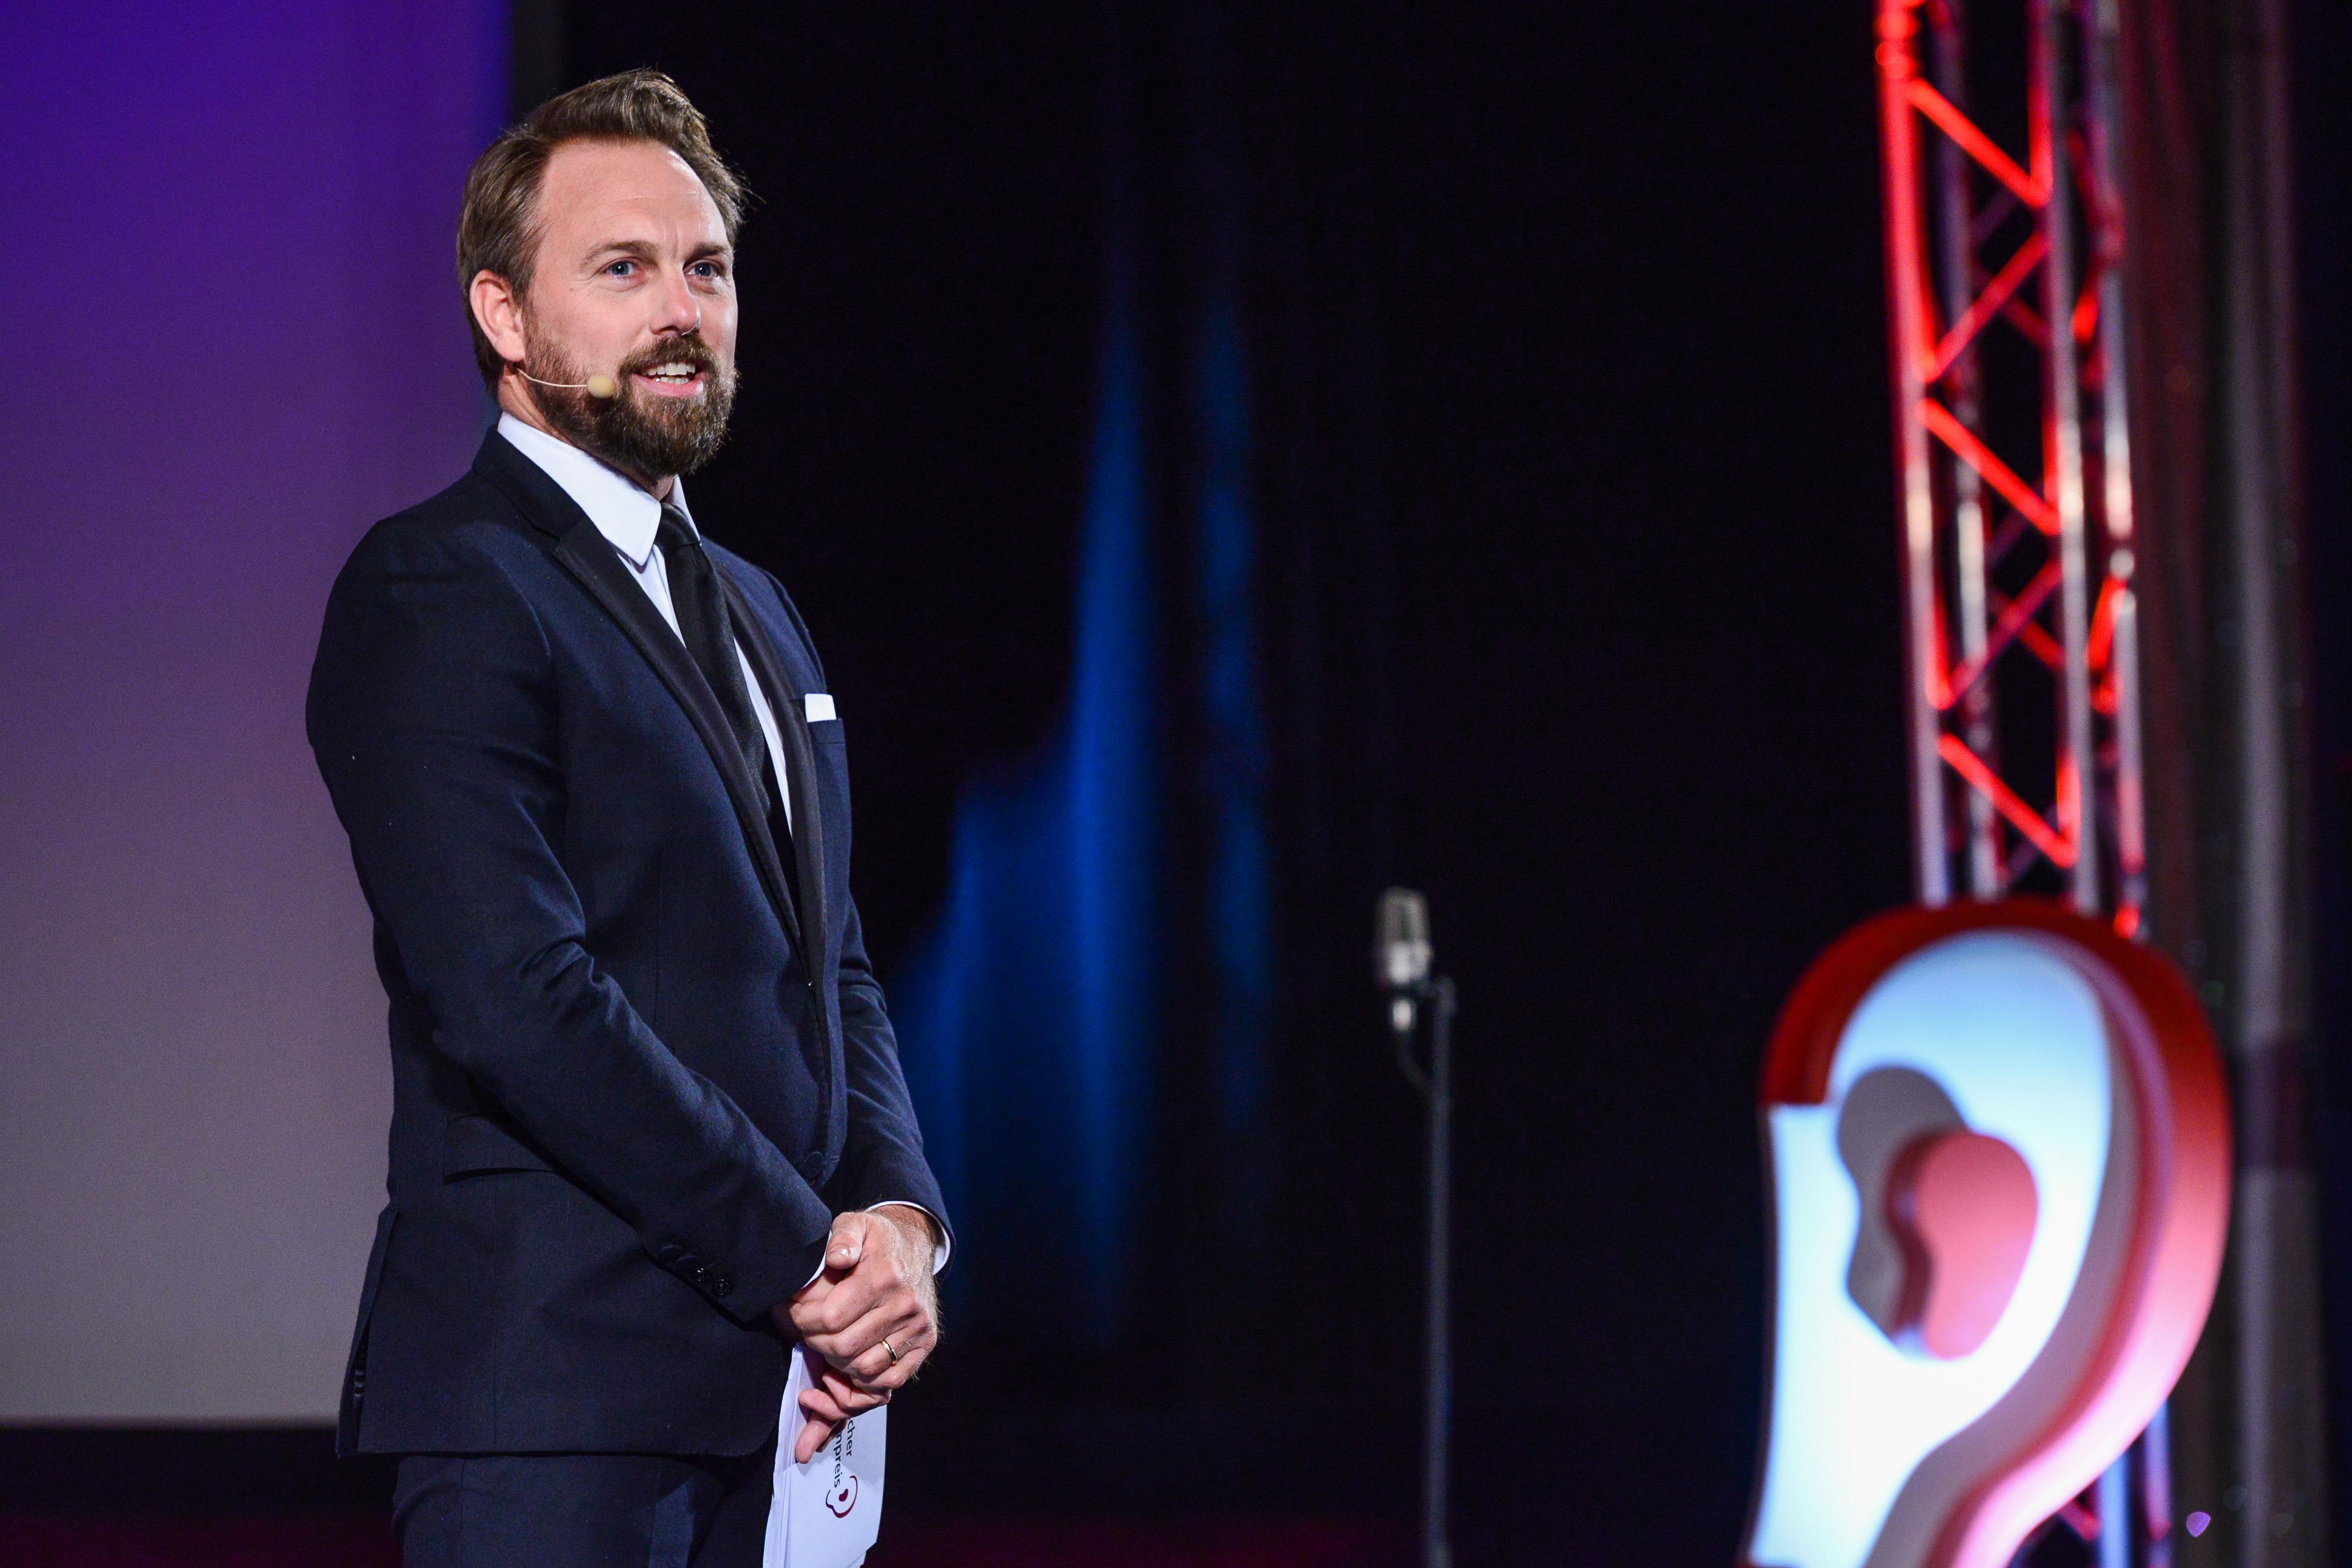 Deutscher Hörfilmpreis 2019 Steven Gätjen Moderiert Die Gala An